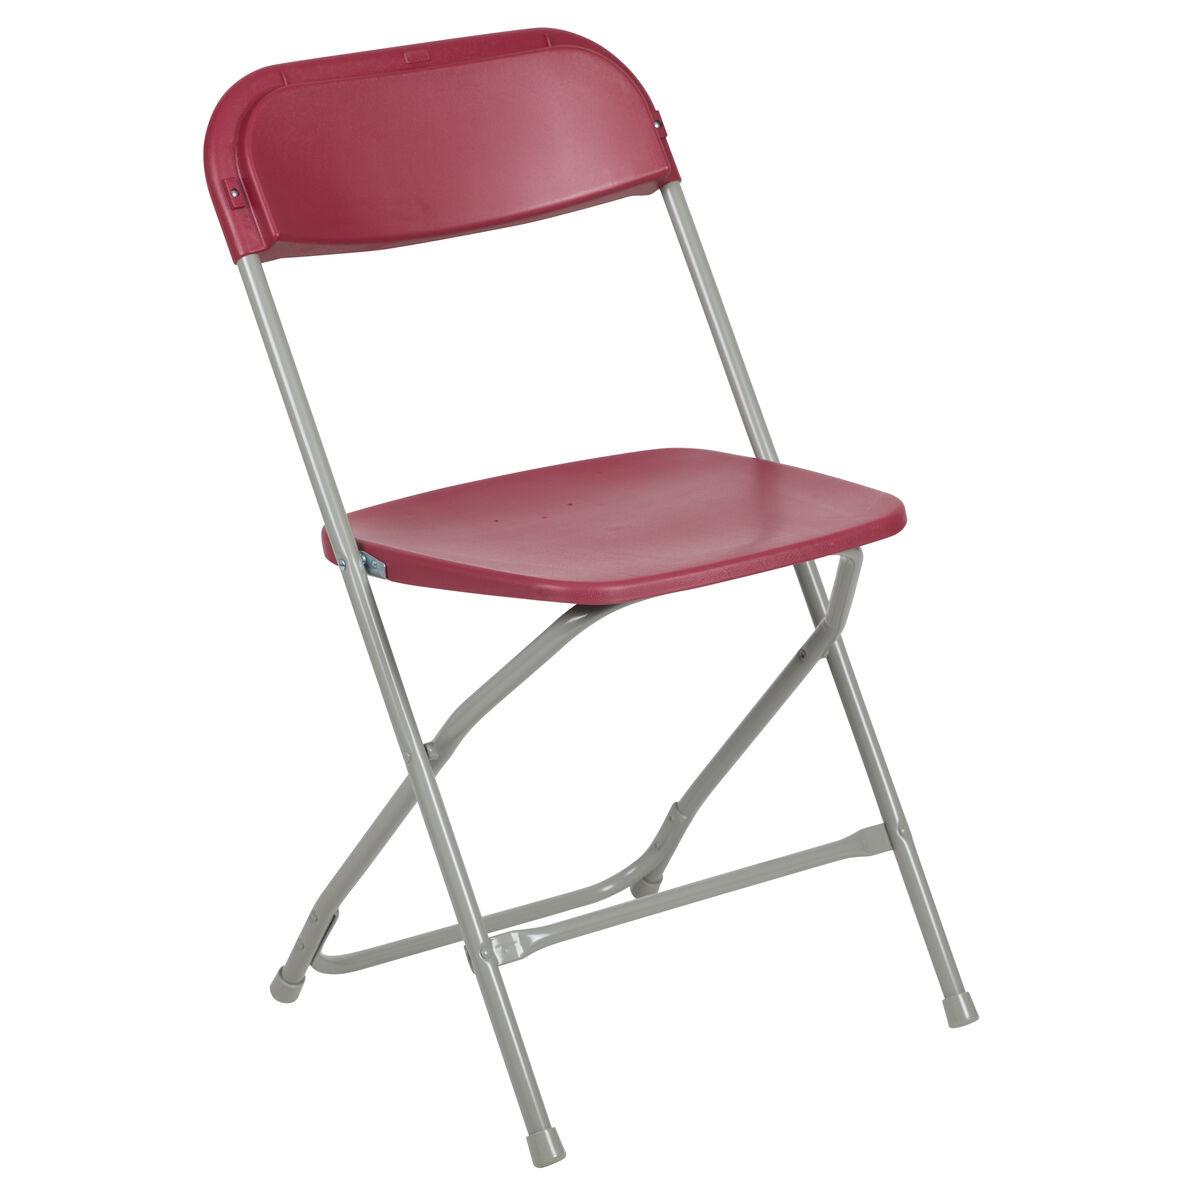 Fine Hercules Series 650 Lb Capacity Premium Red Plastic Folding Chair Squirreltailoven Fun Painted Chair Ideas Images Squirreltailovenorg